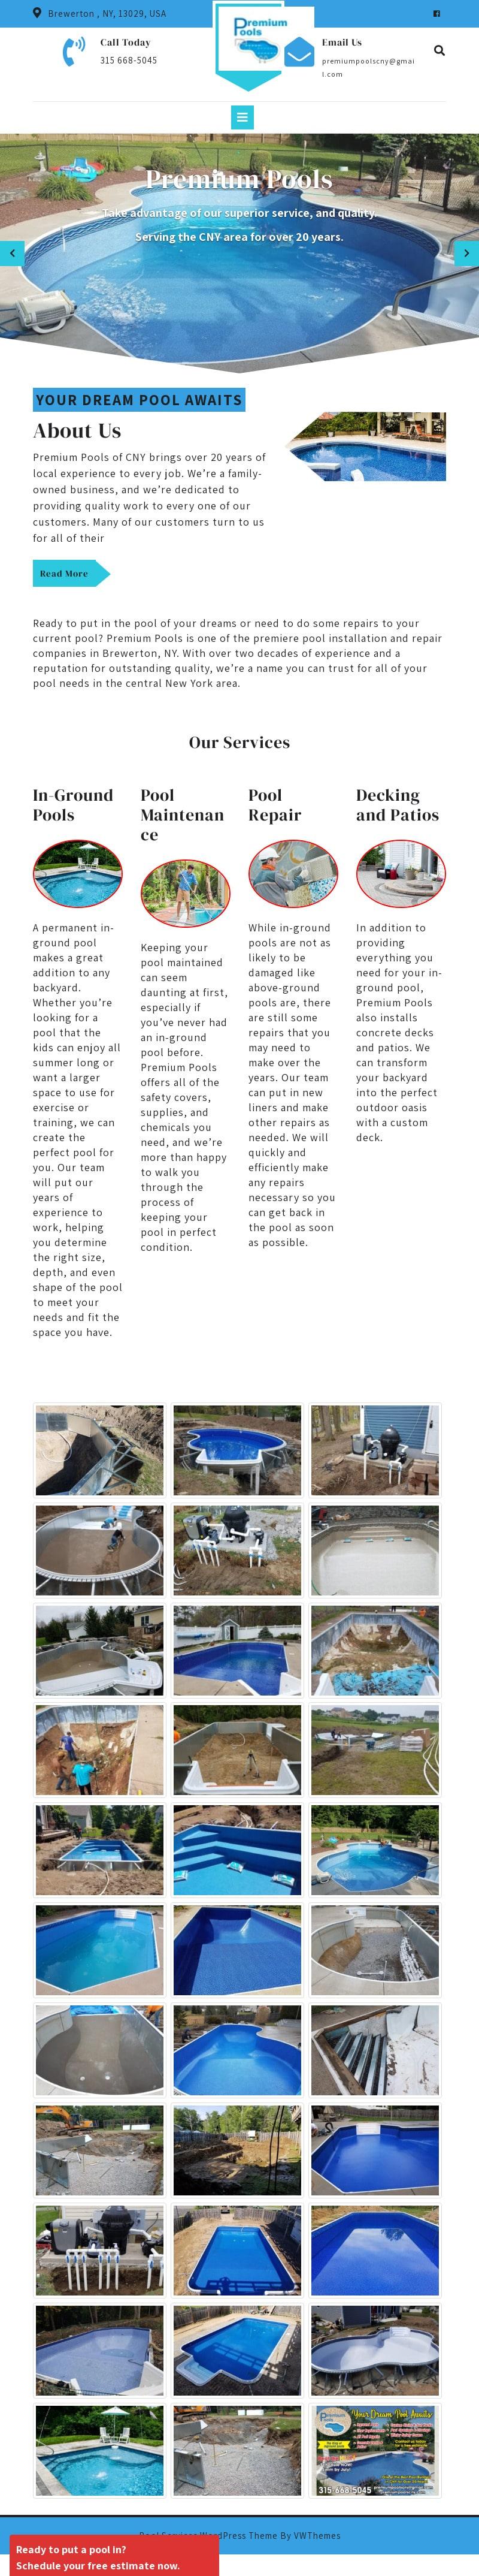 Premium Pools CNY 5iPad